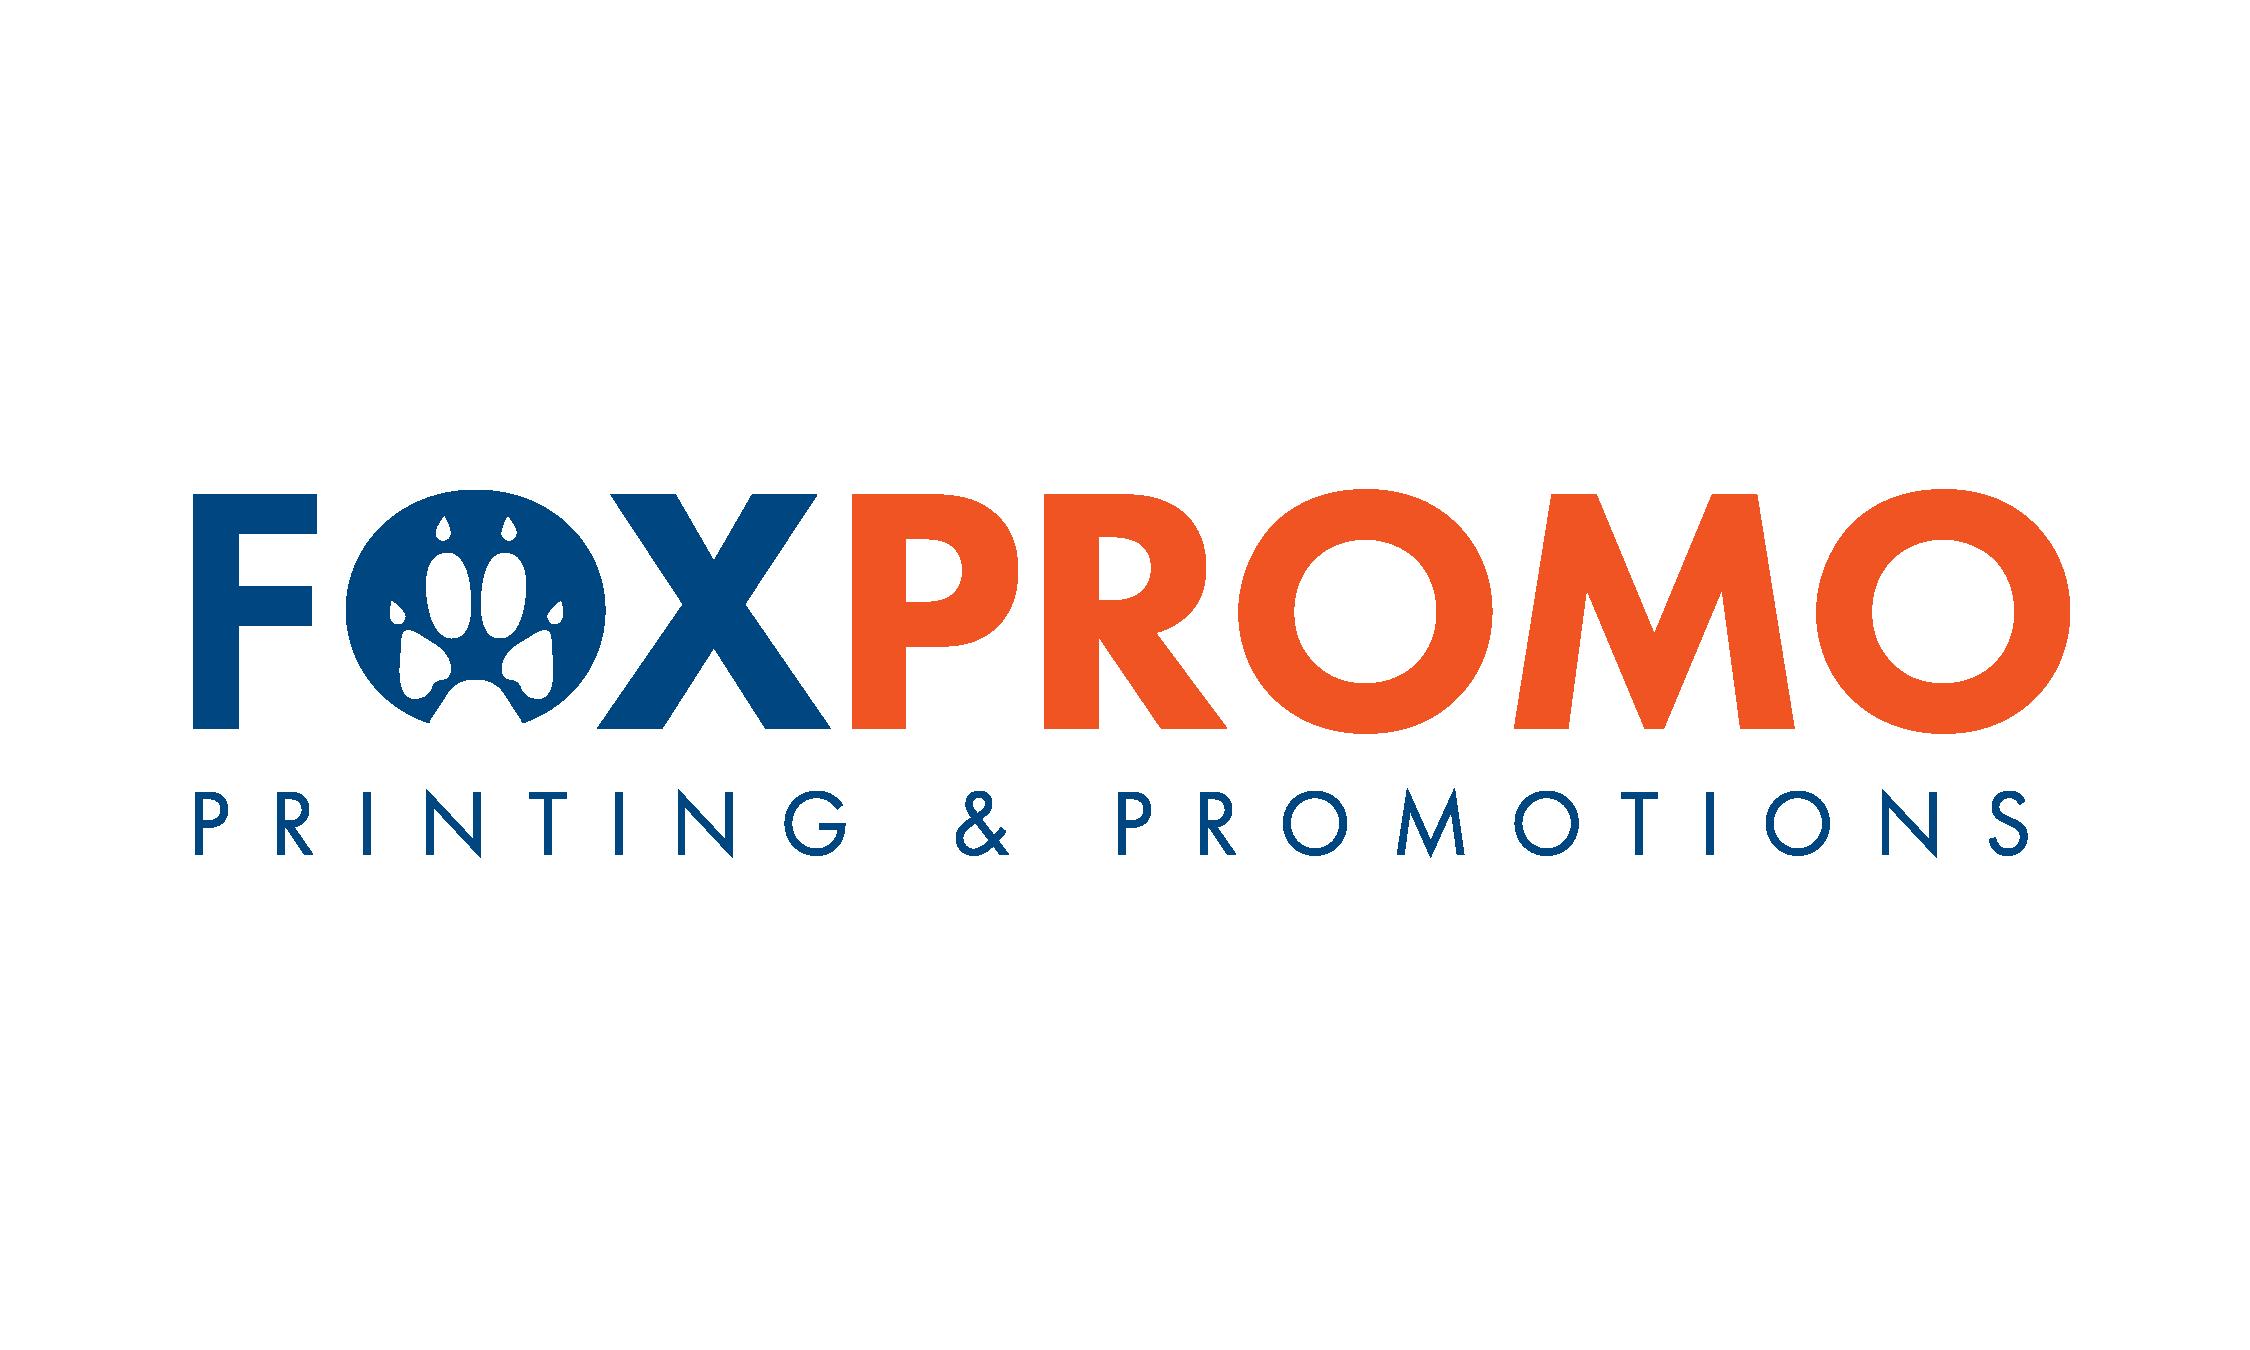 https://growthzonesitesprod.azureedge.net/wp-content/uploads/sites/1494/2021/06/Fox_Promo_Logo.png